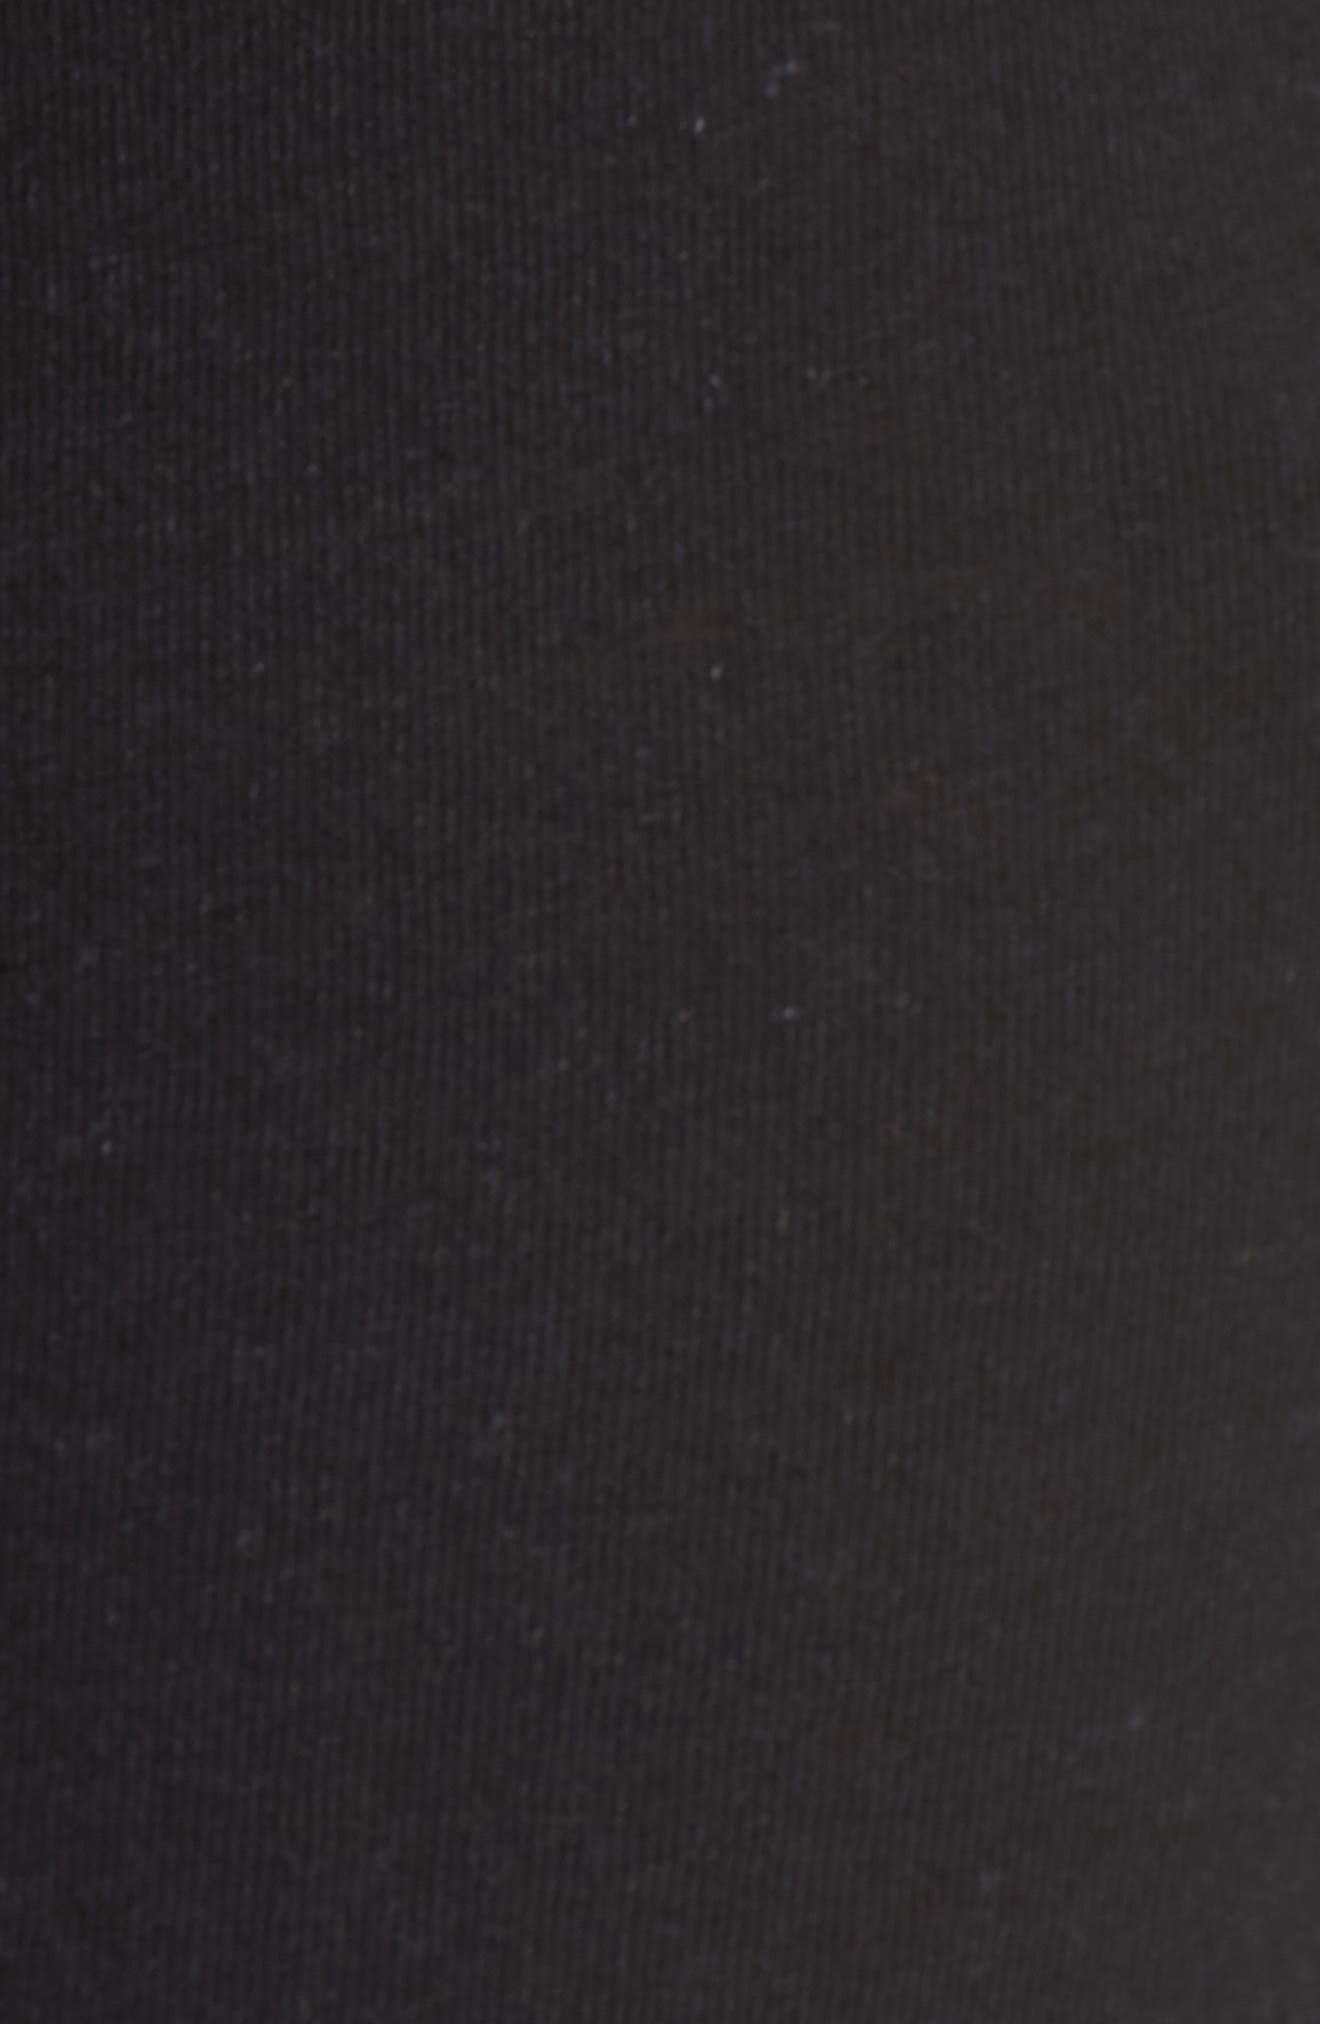 Clementine Cotton & Silk Pajama Pants,                             Alternate thumbnail 7, color,                             Black